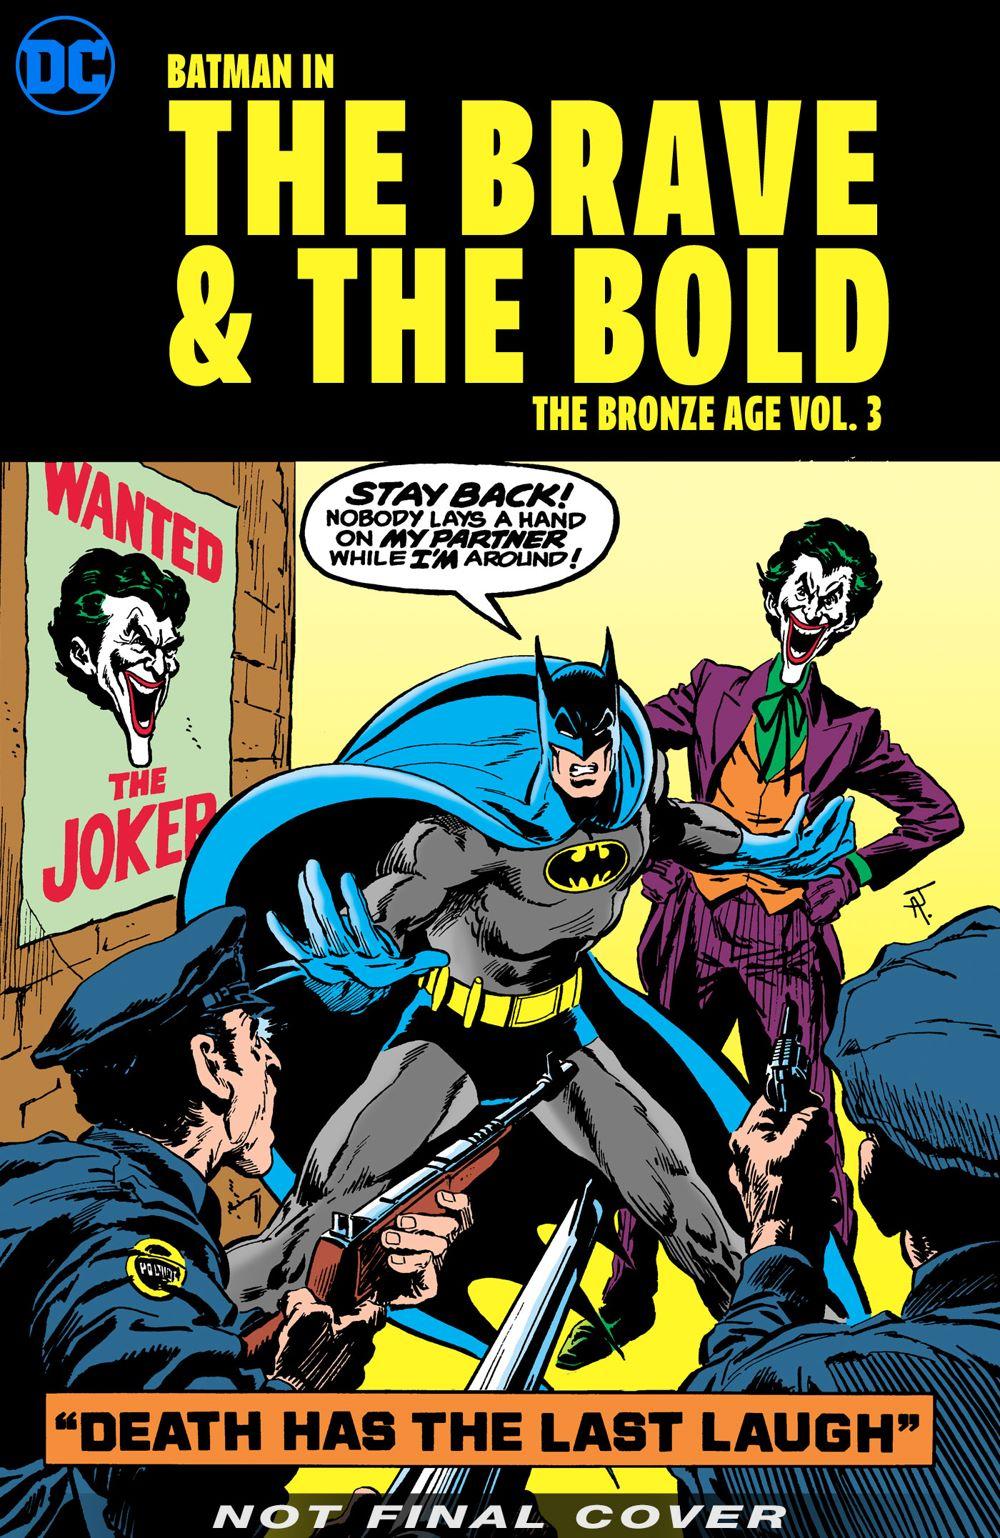 batmanbravebold-tba-v3_advDC DC Comics July 2021 Solicitations